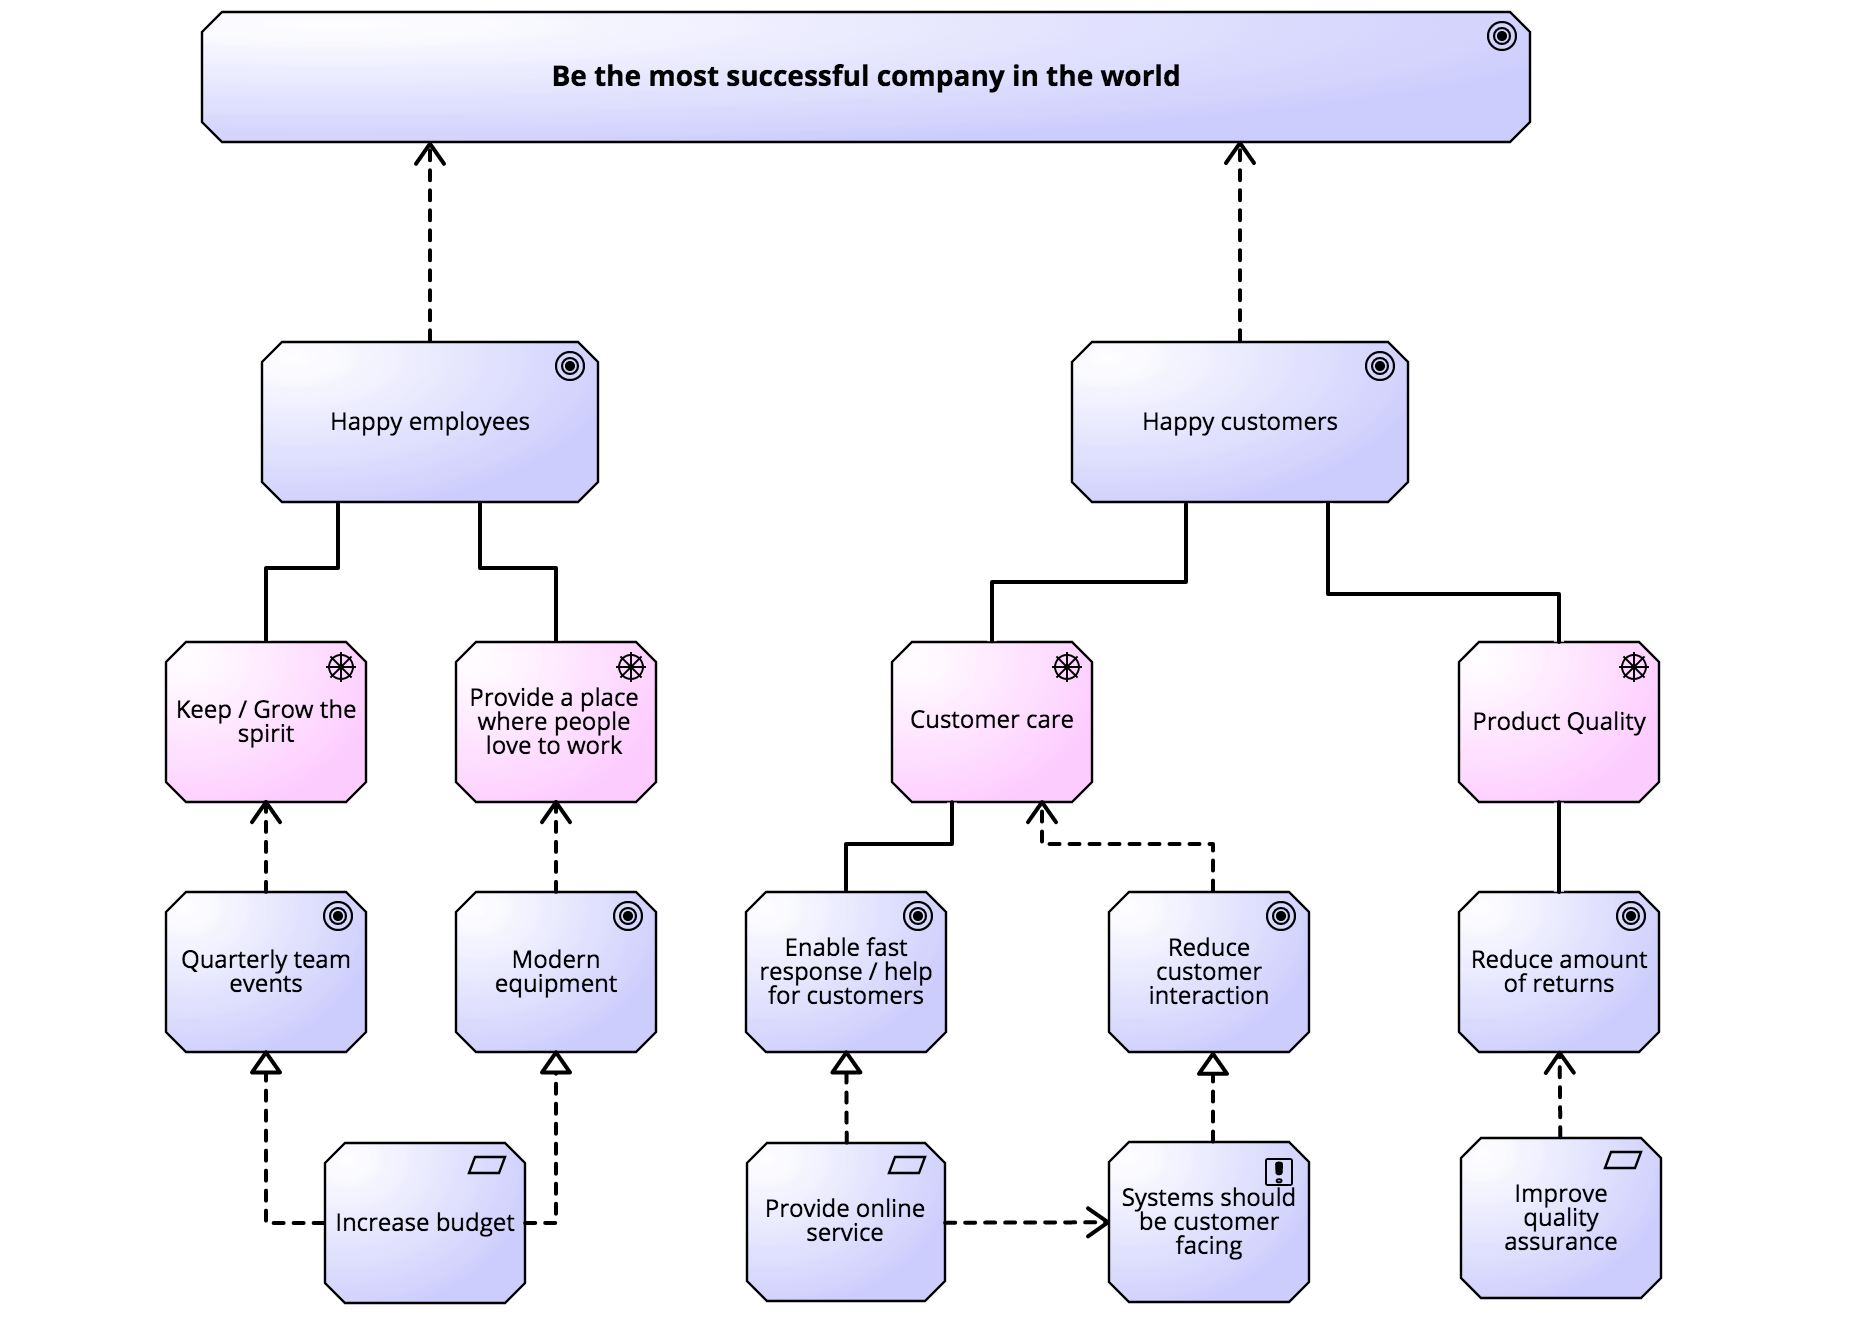 Enterprise Architecture: Strategy